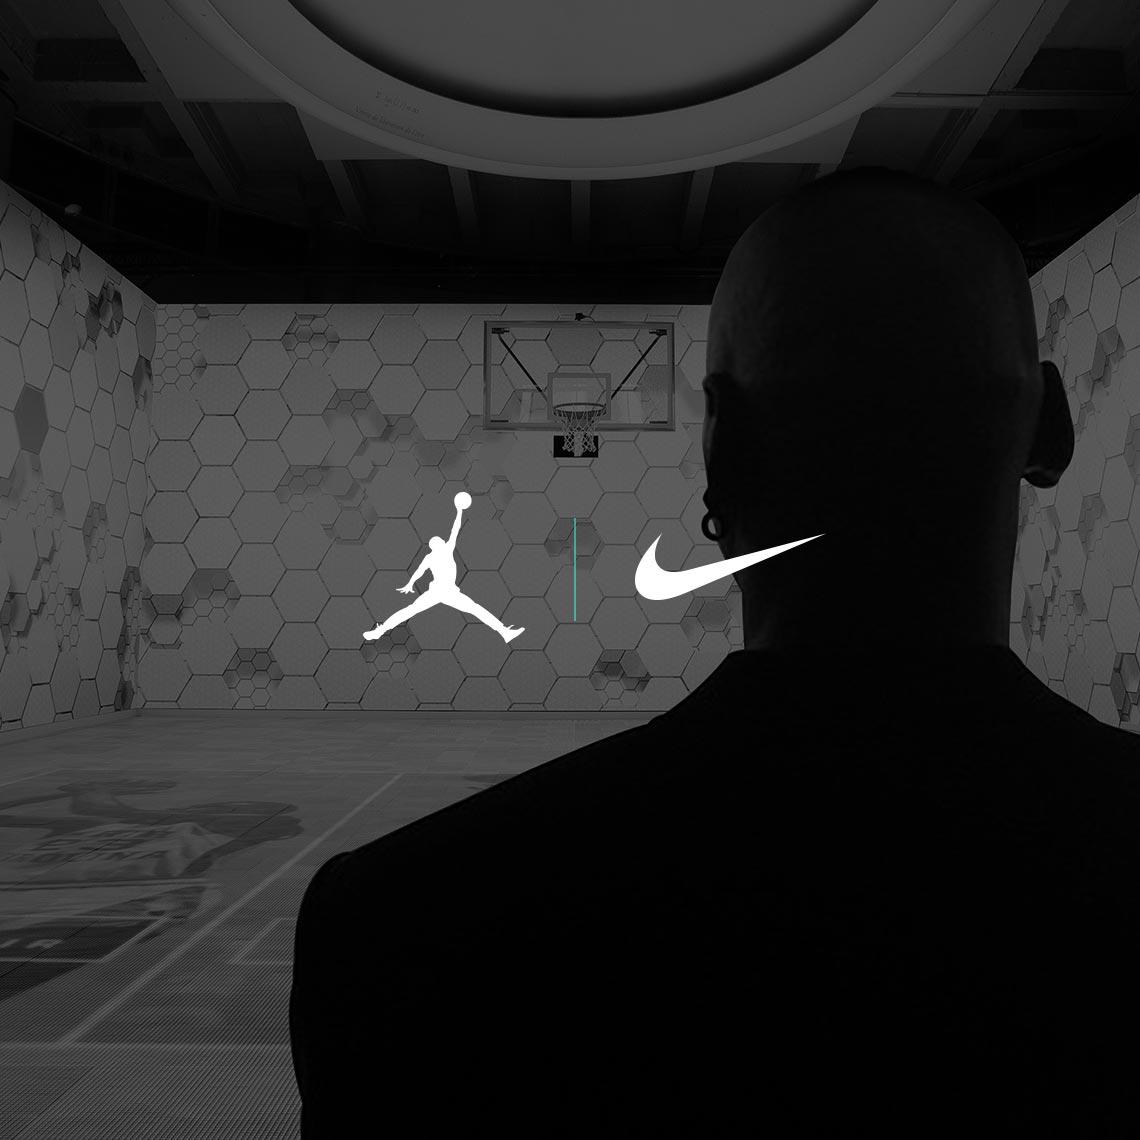 Jordan | Paris Interrupted